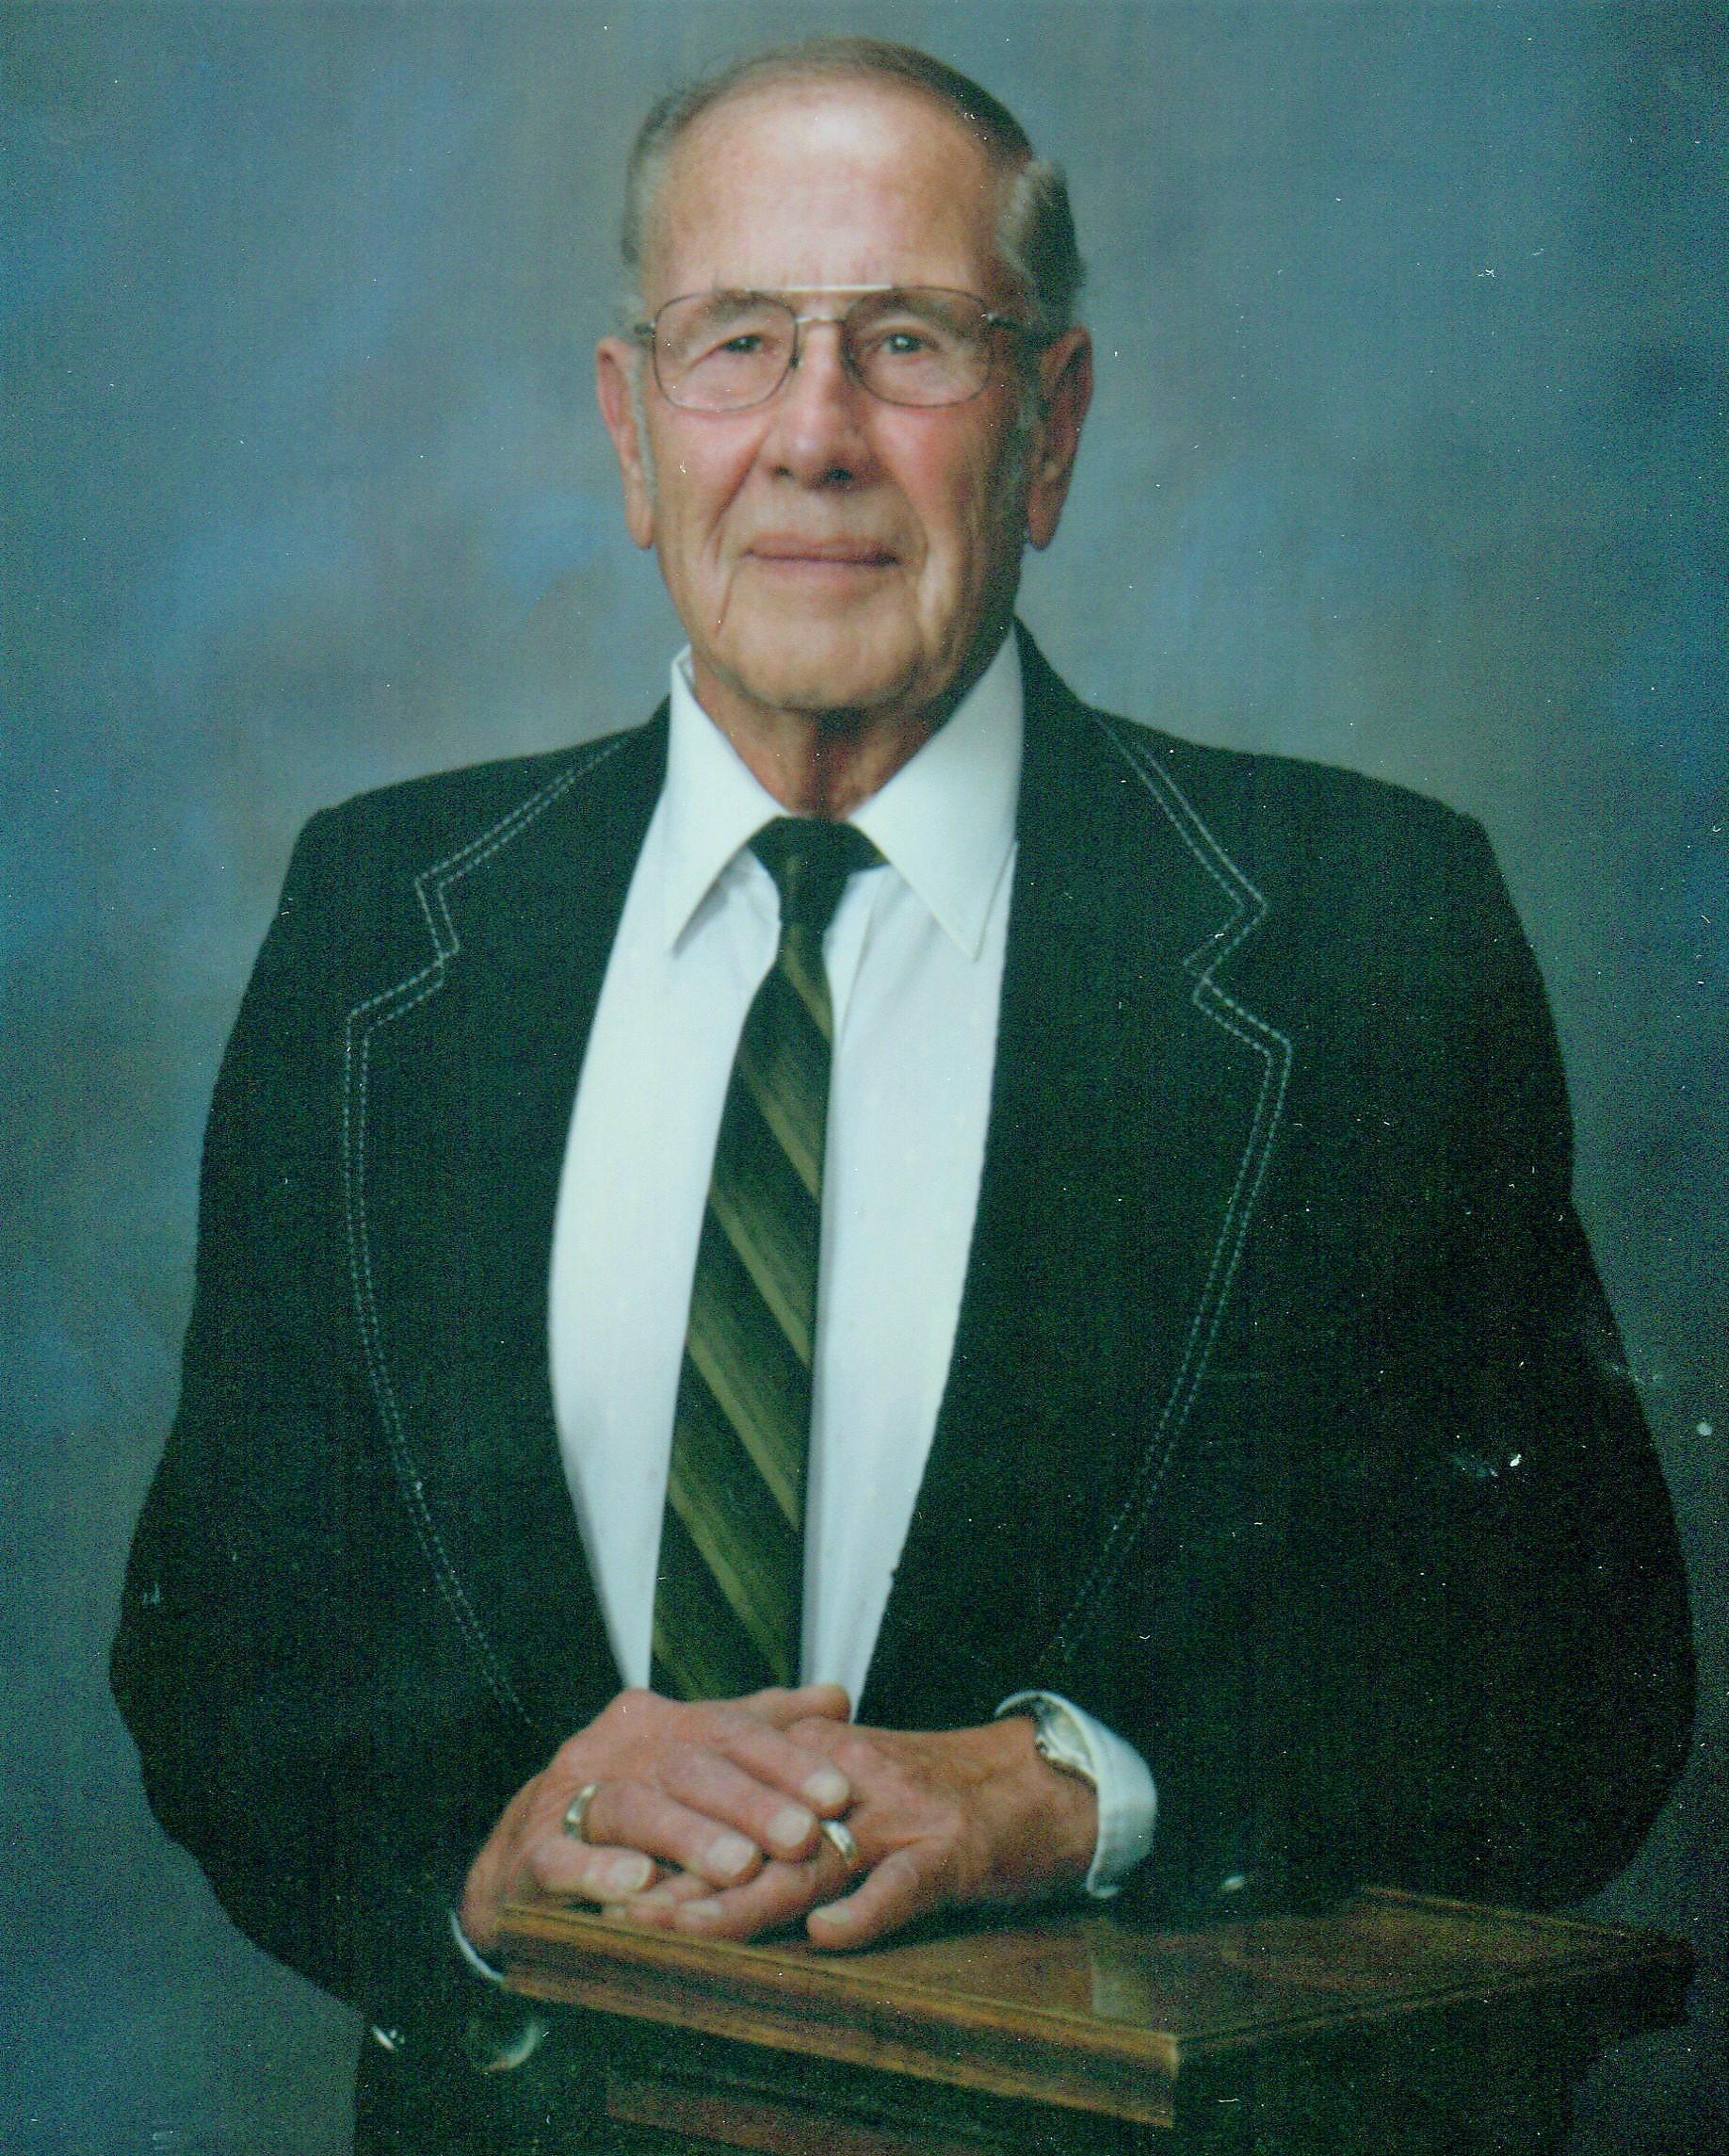 Marvin E. Ziegler, 85, Scottsbluff